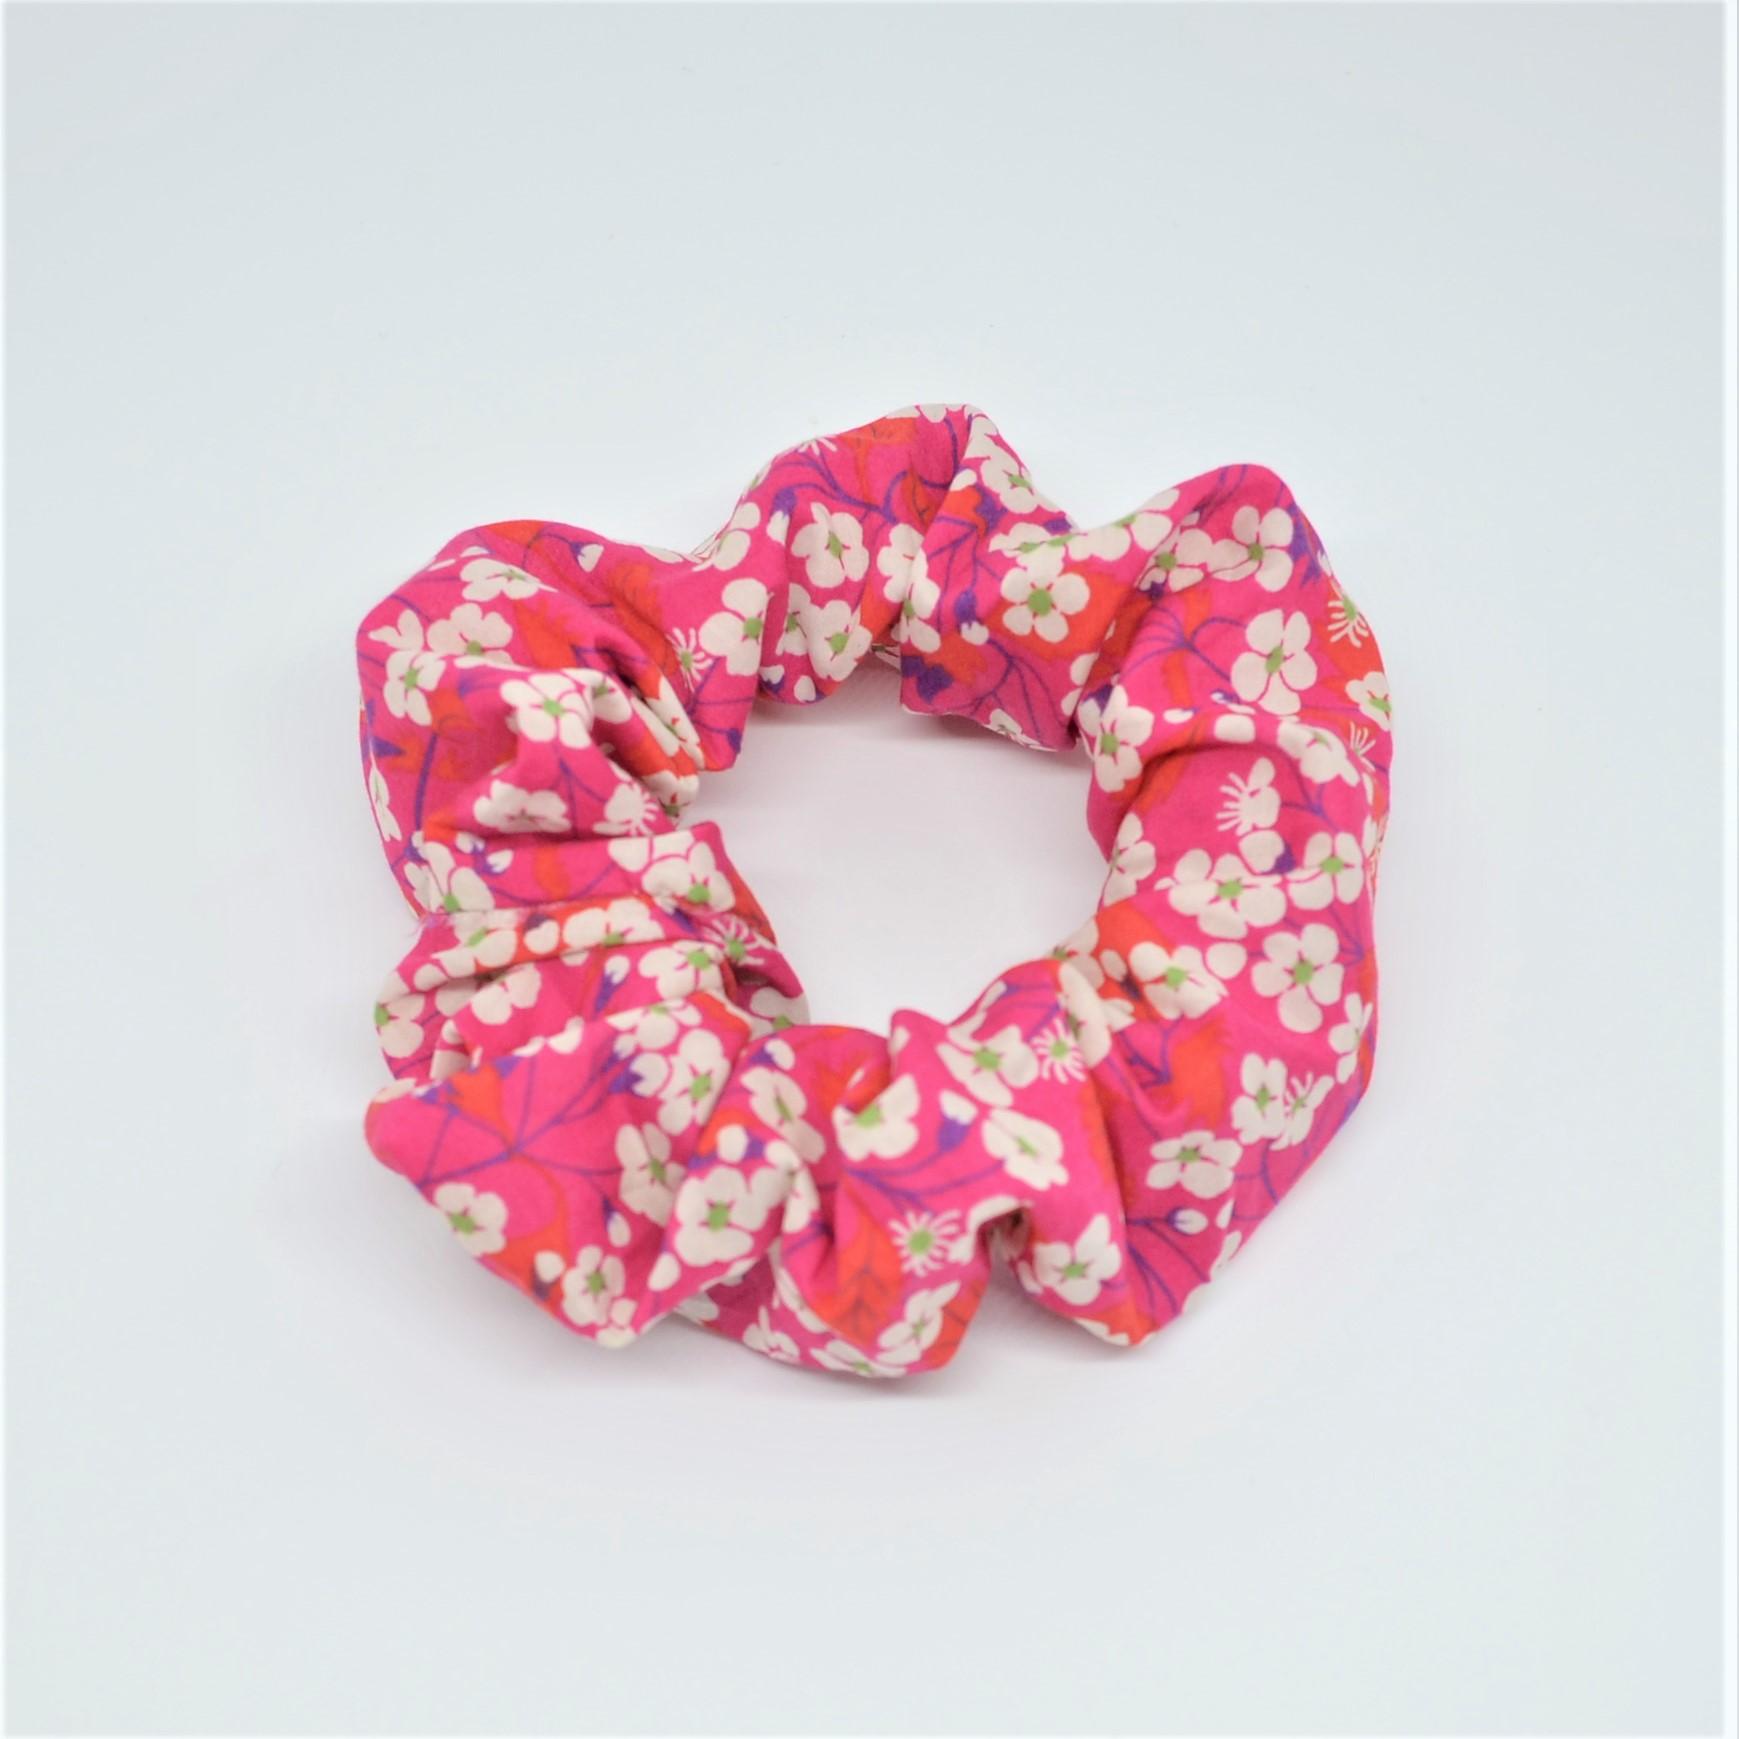 Chouchou cheveux scrunchie liberty Mitsi rose--9996010519766